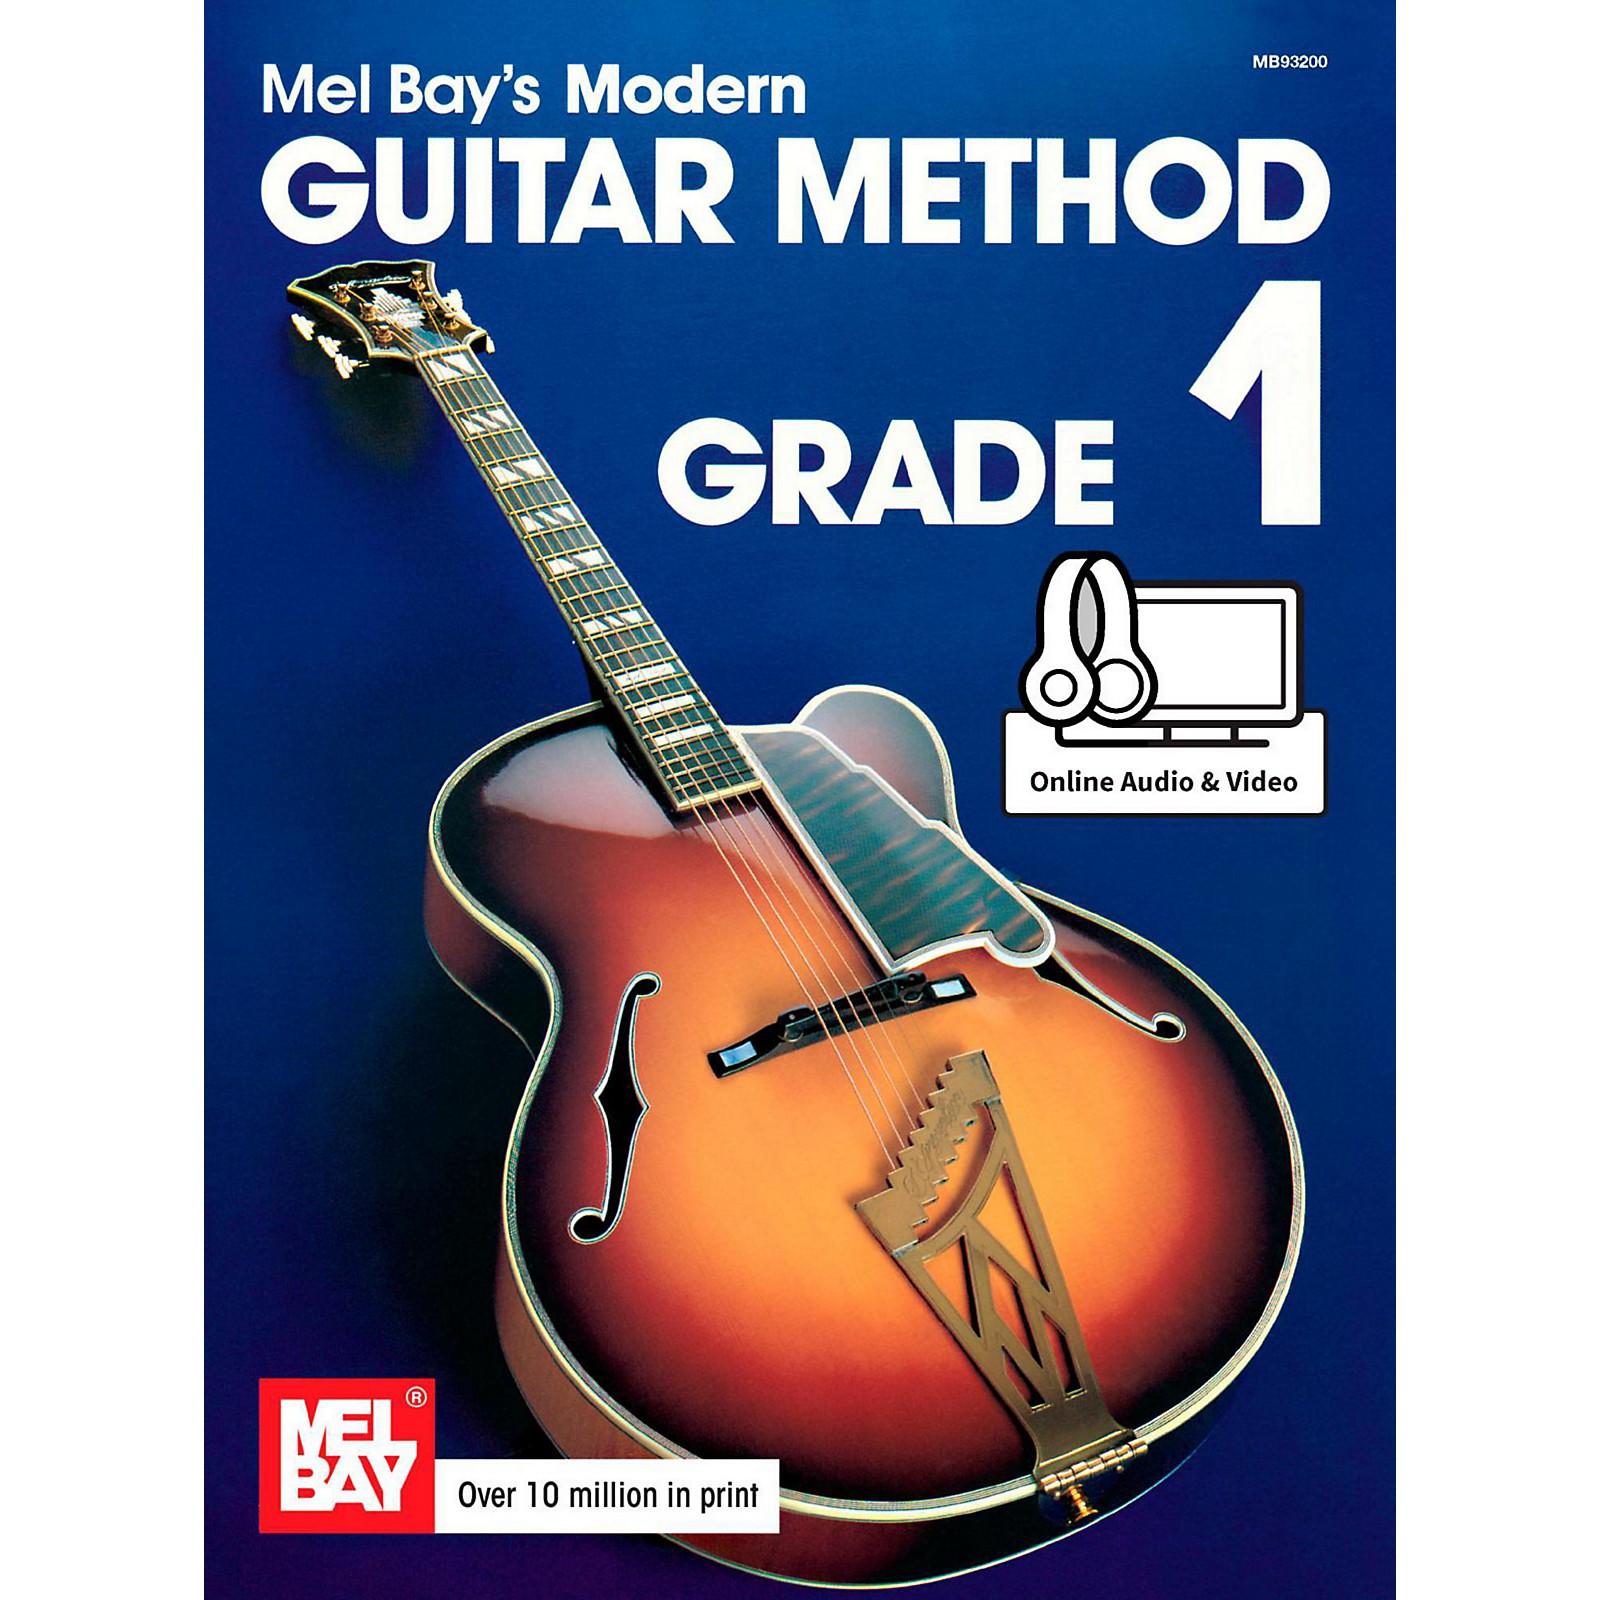 Mel Bay Modern Guitar Method Grade 1 Book